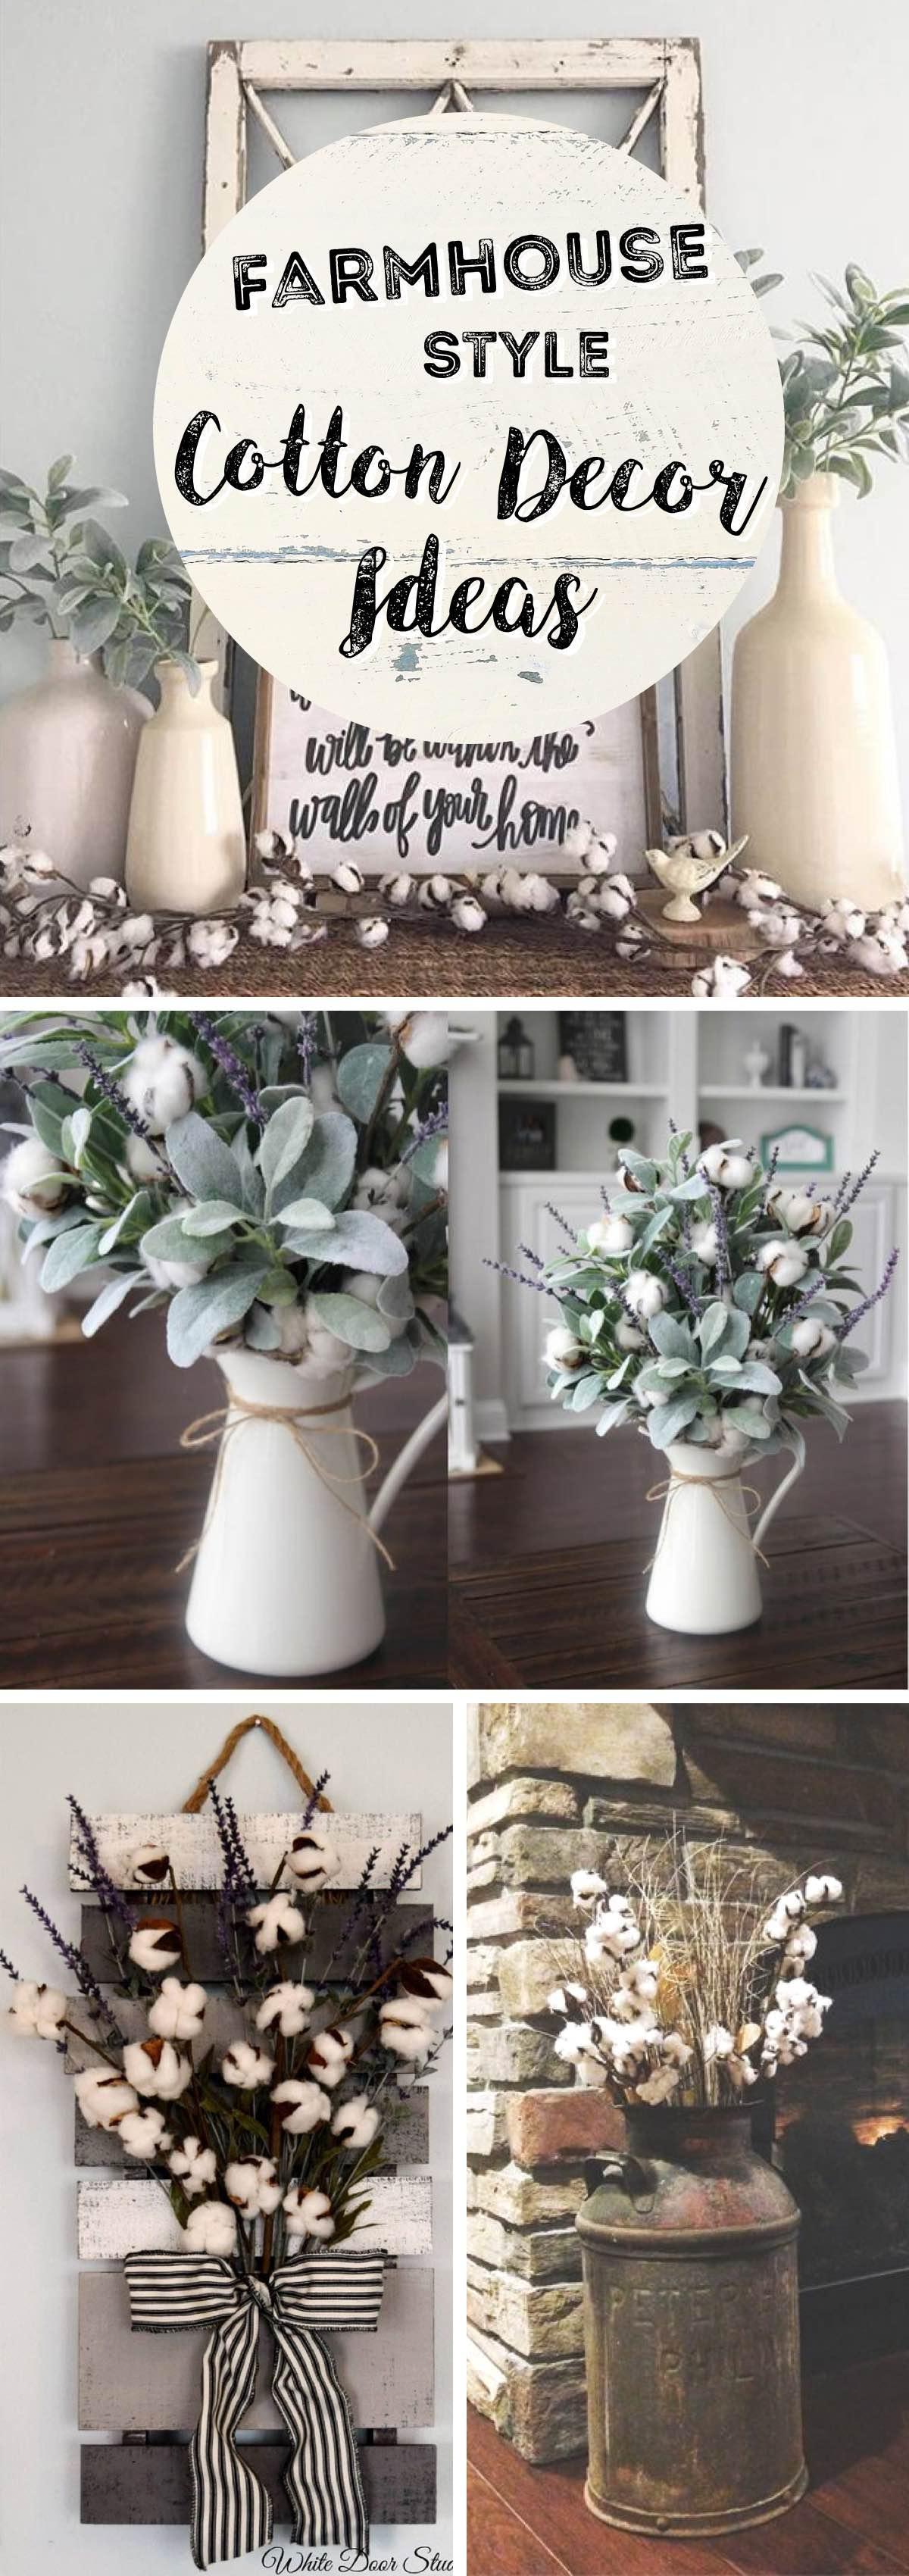 Idee Deco Vase Rond best farmhouse style cotton decor ideas